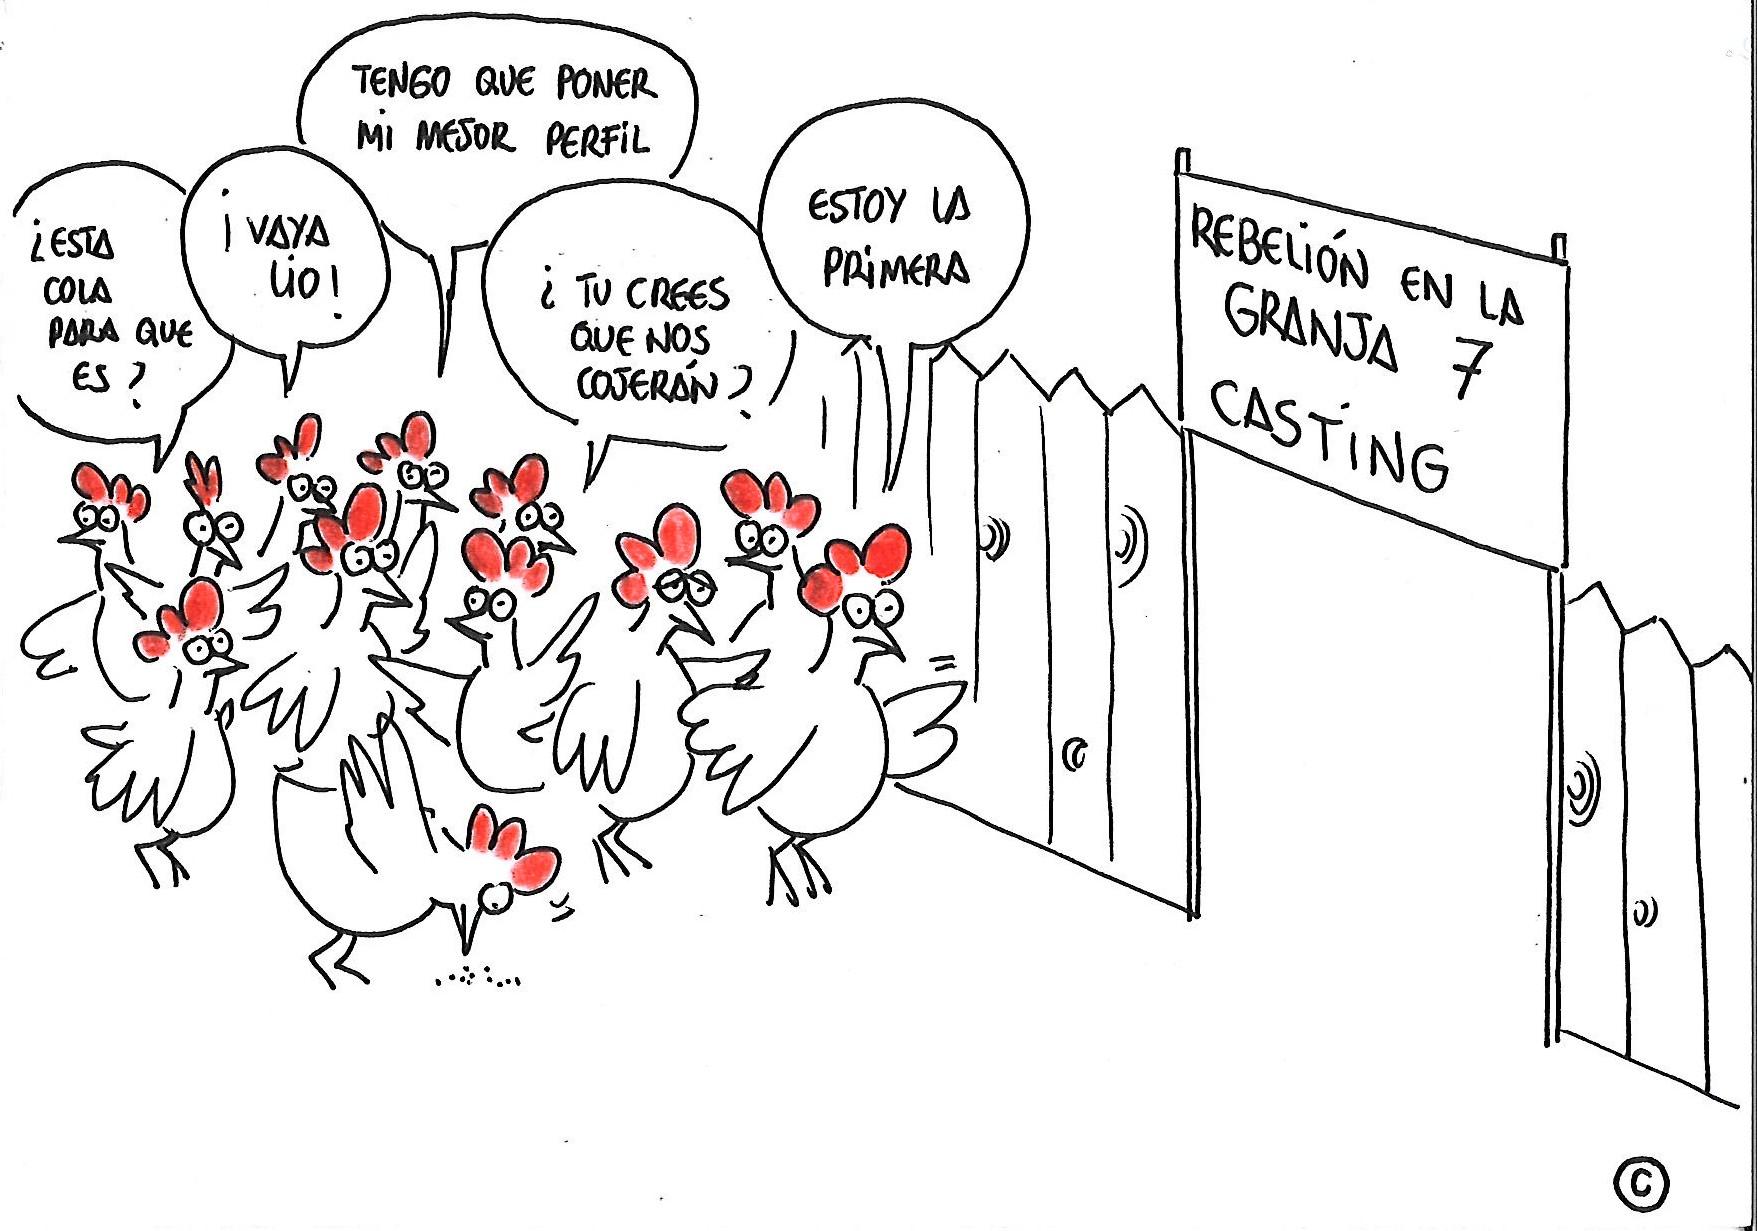 13-Casting